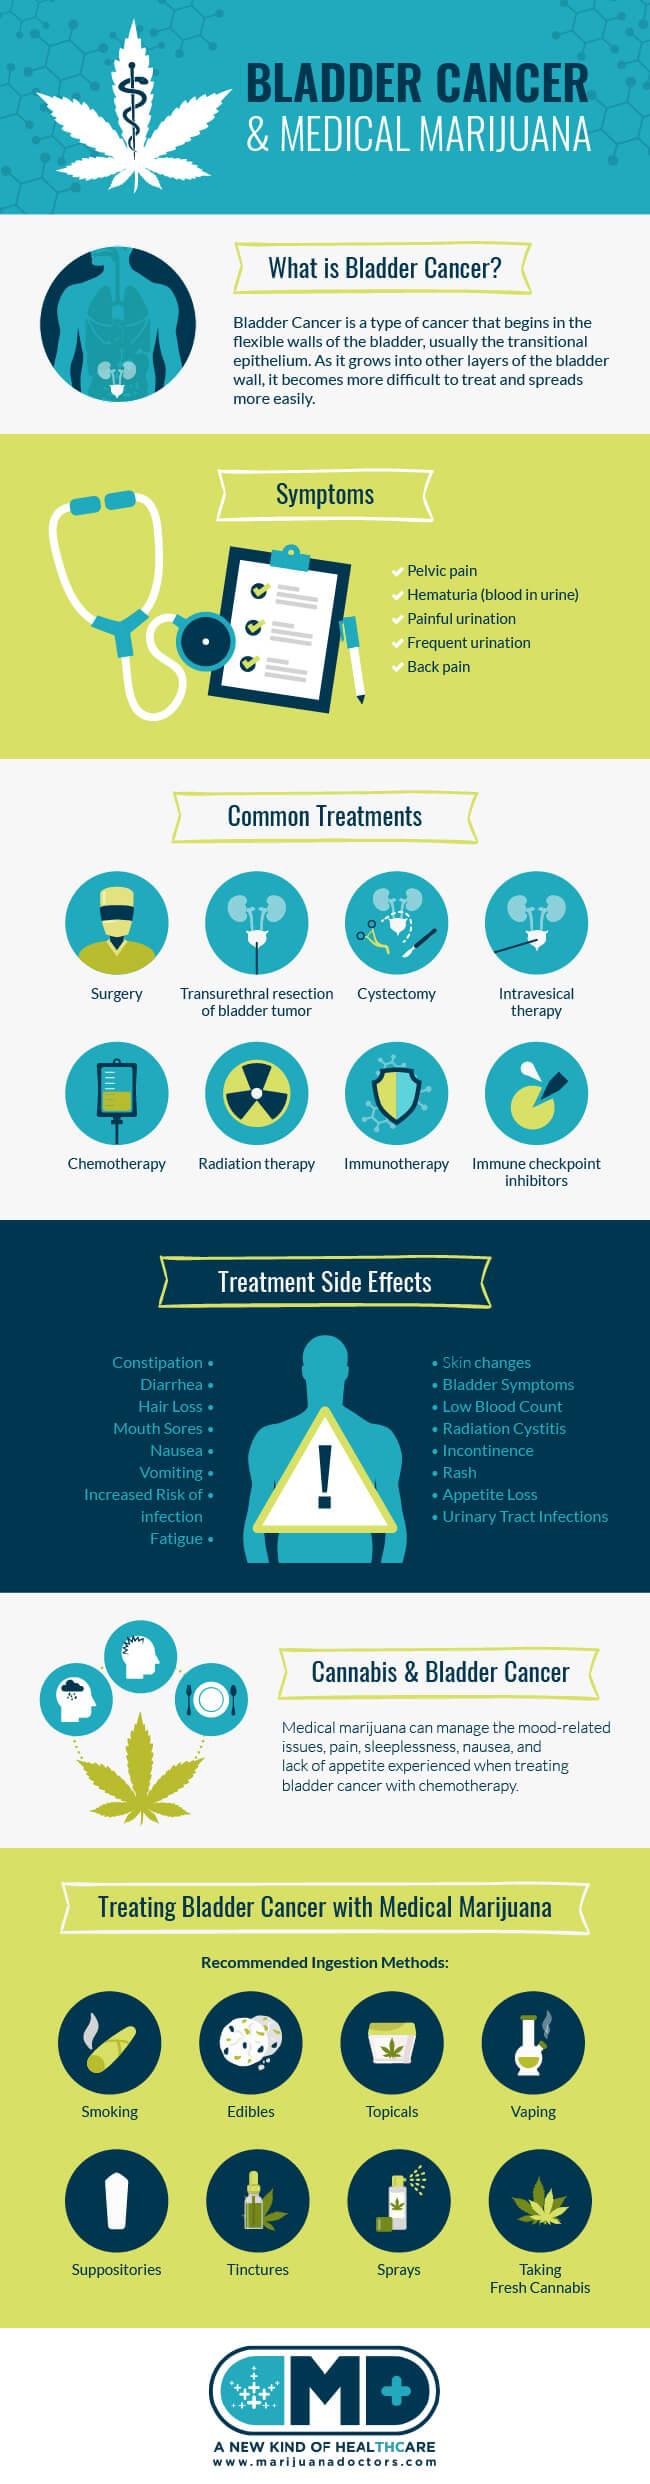 Medical Marijuana for Bladder Cancer - Marijuana Doctors